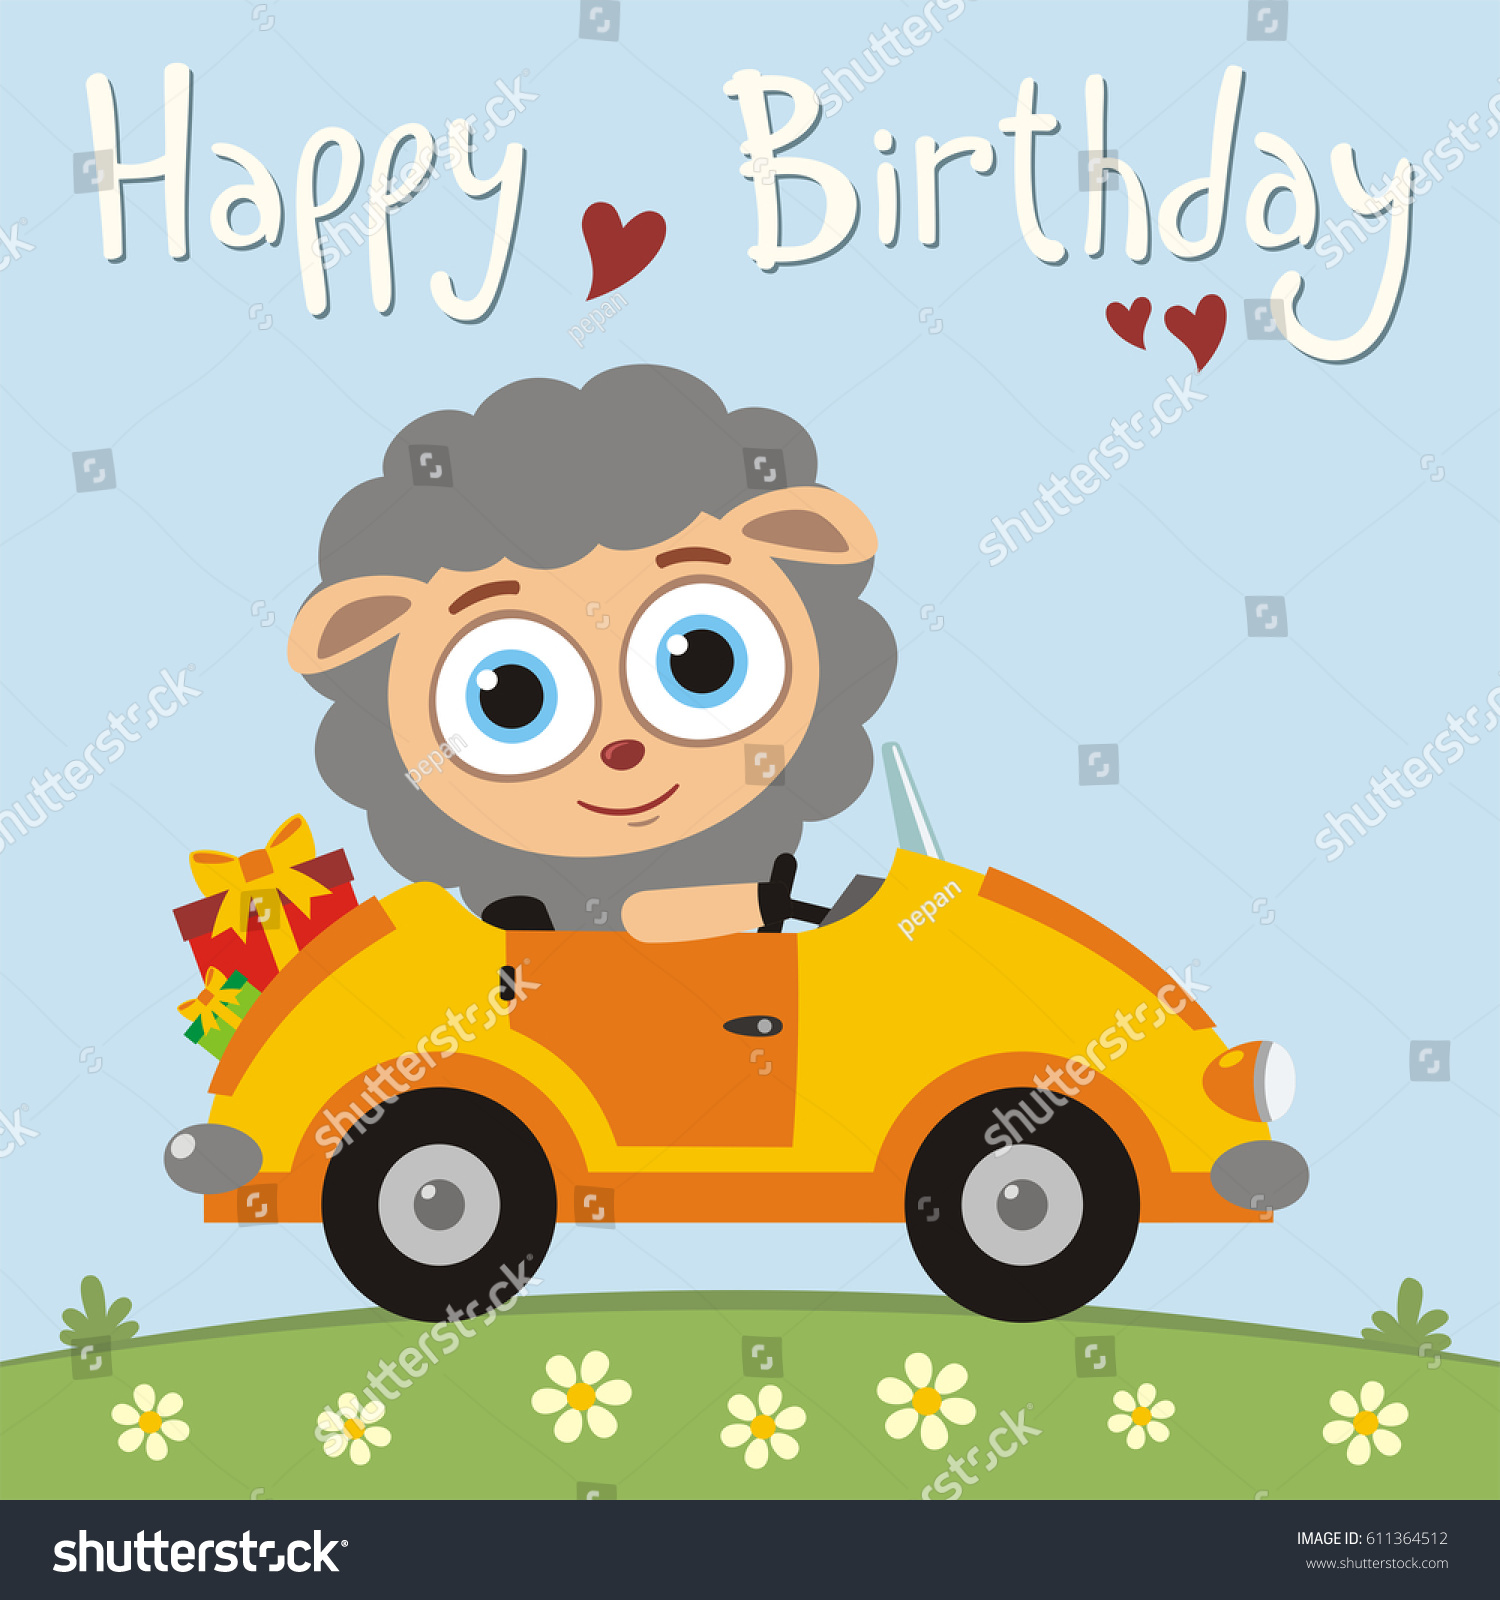 Car Birthday Cards Free Birthday Cards